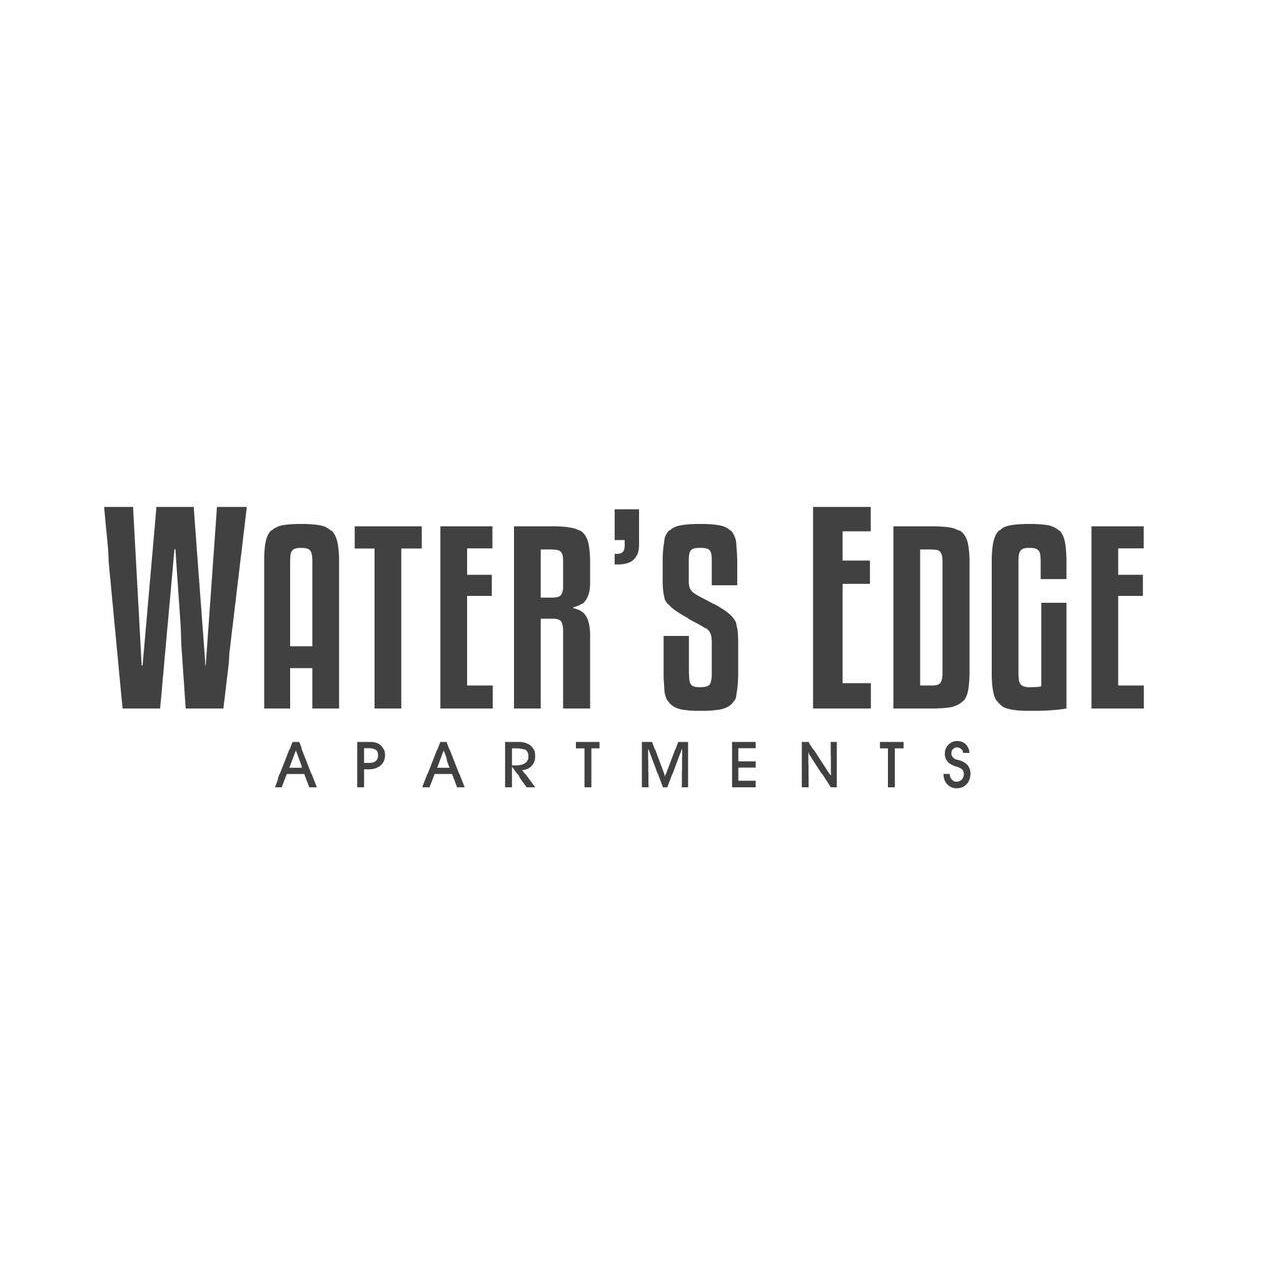 Water's Edge Apartments